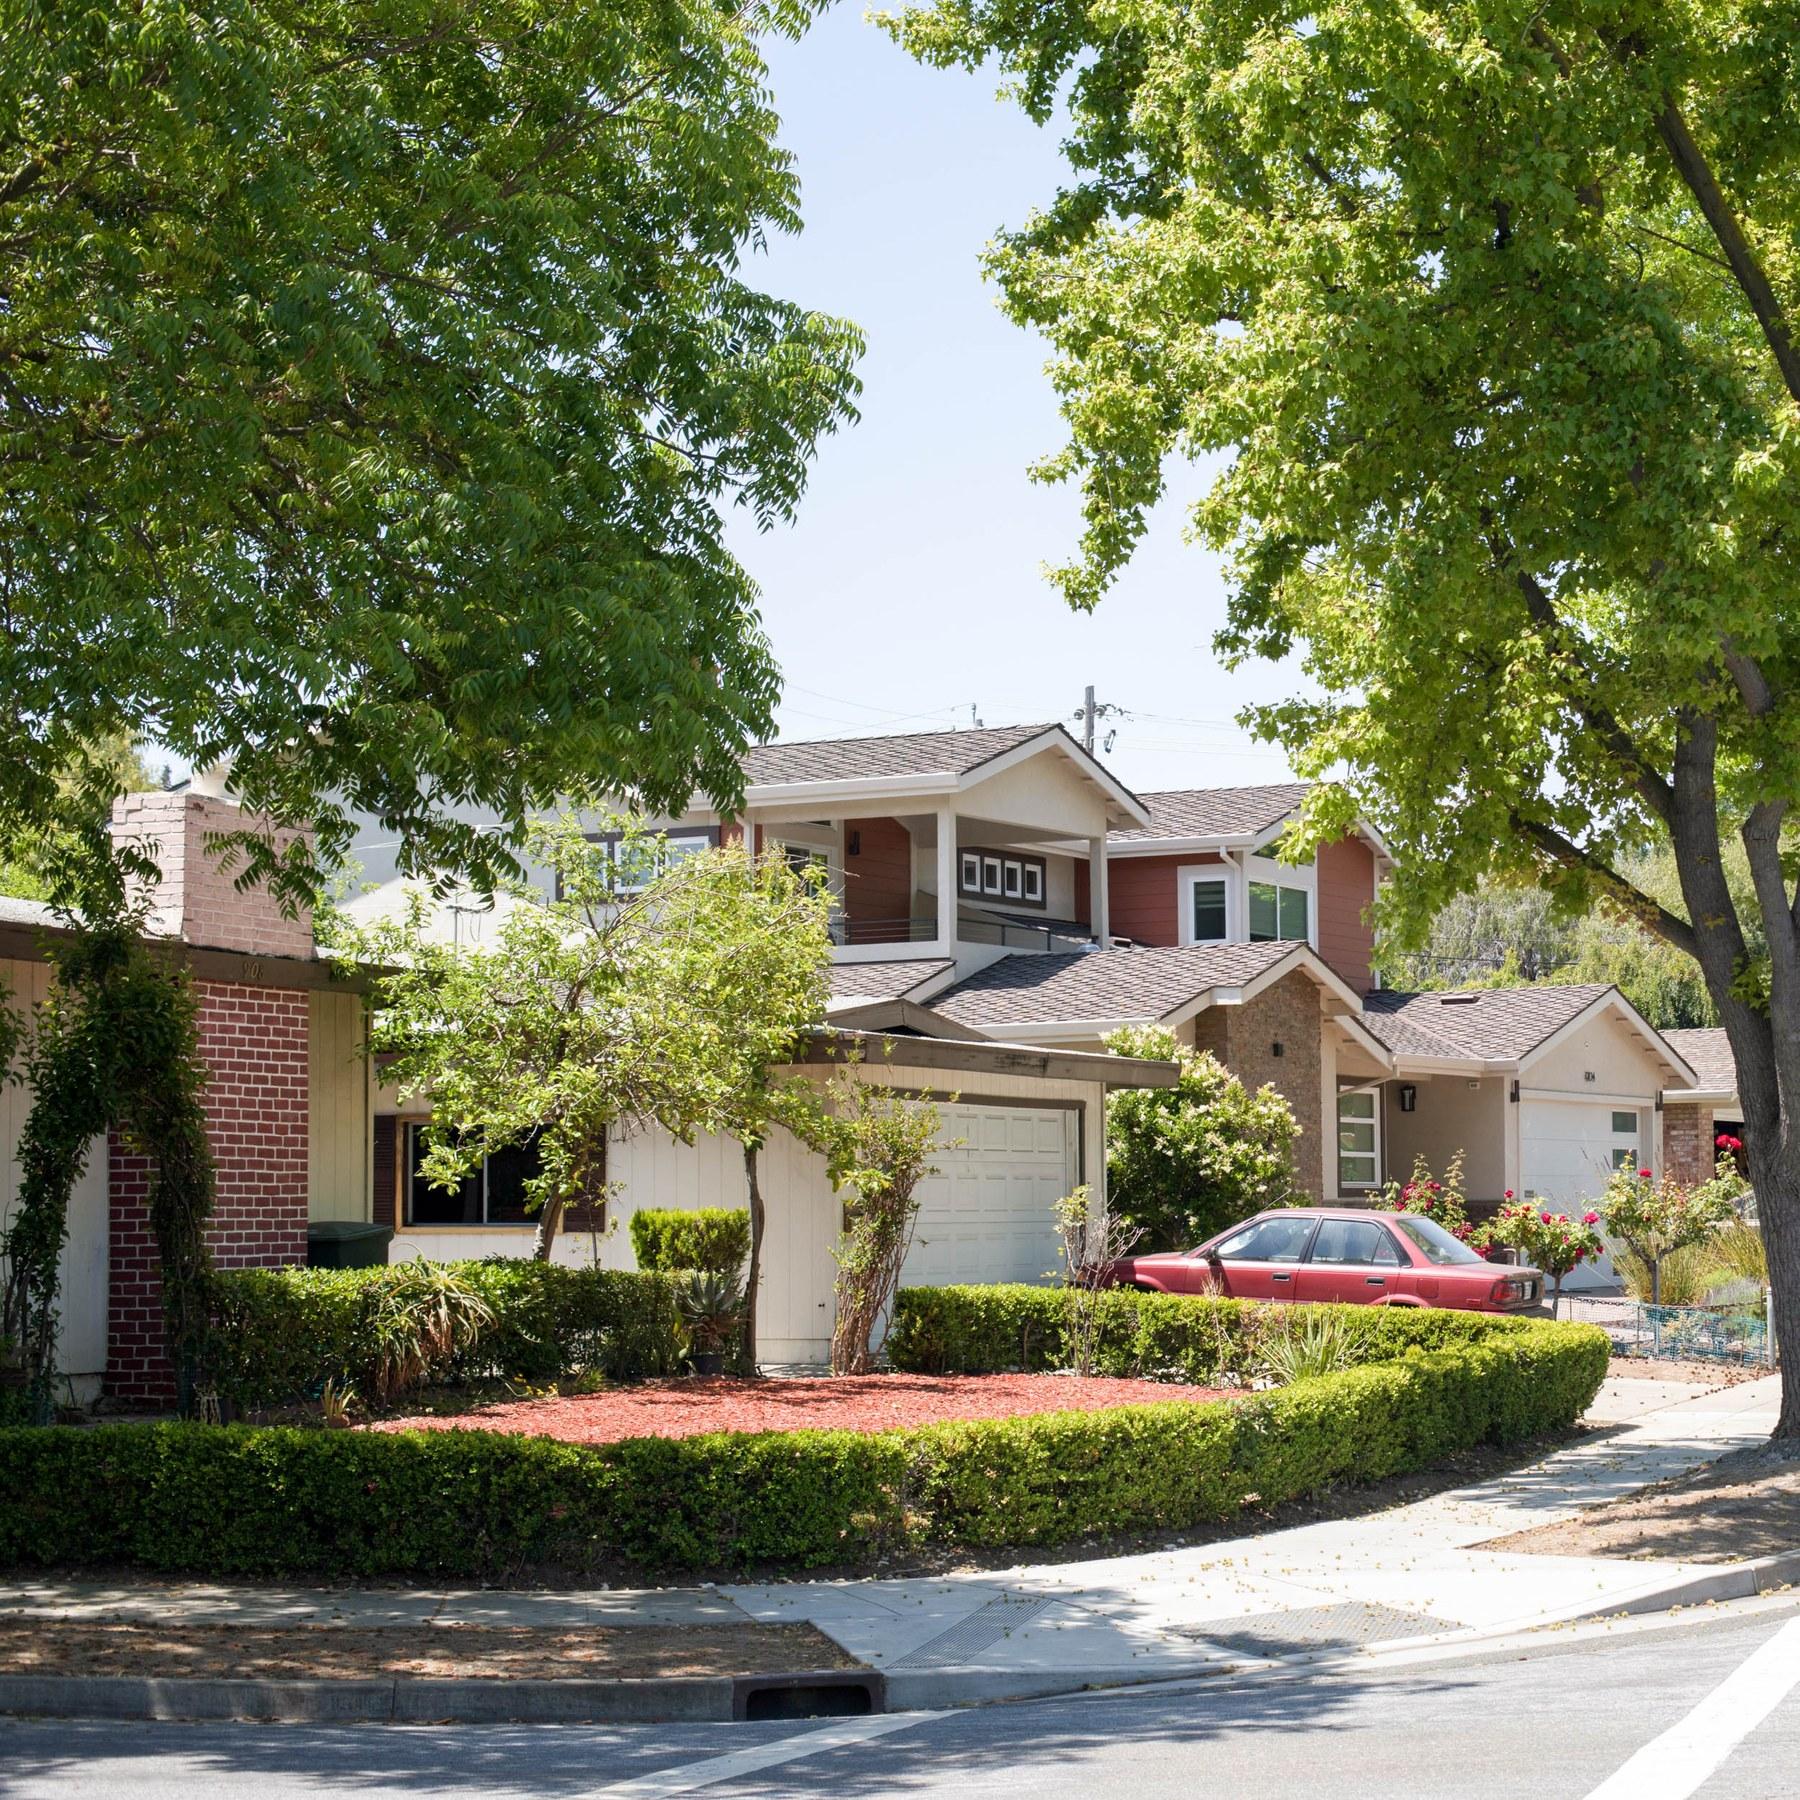 Ponderosa Apartments: Ponderosa, Sunnyvale CA - Neighborhood Guide